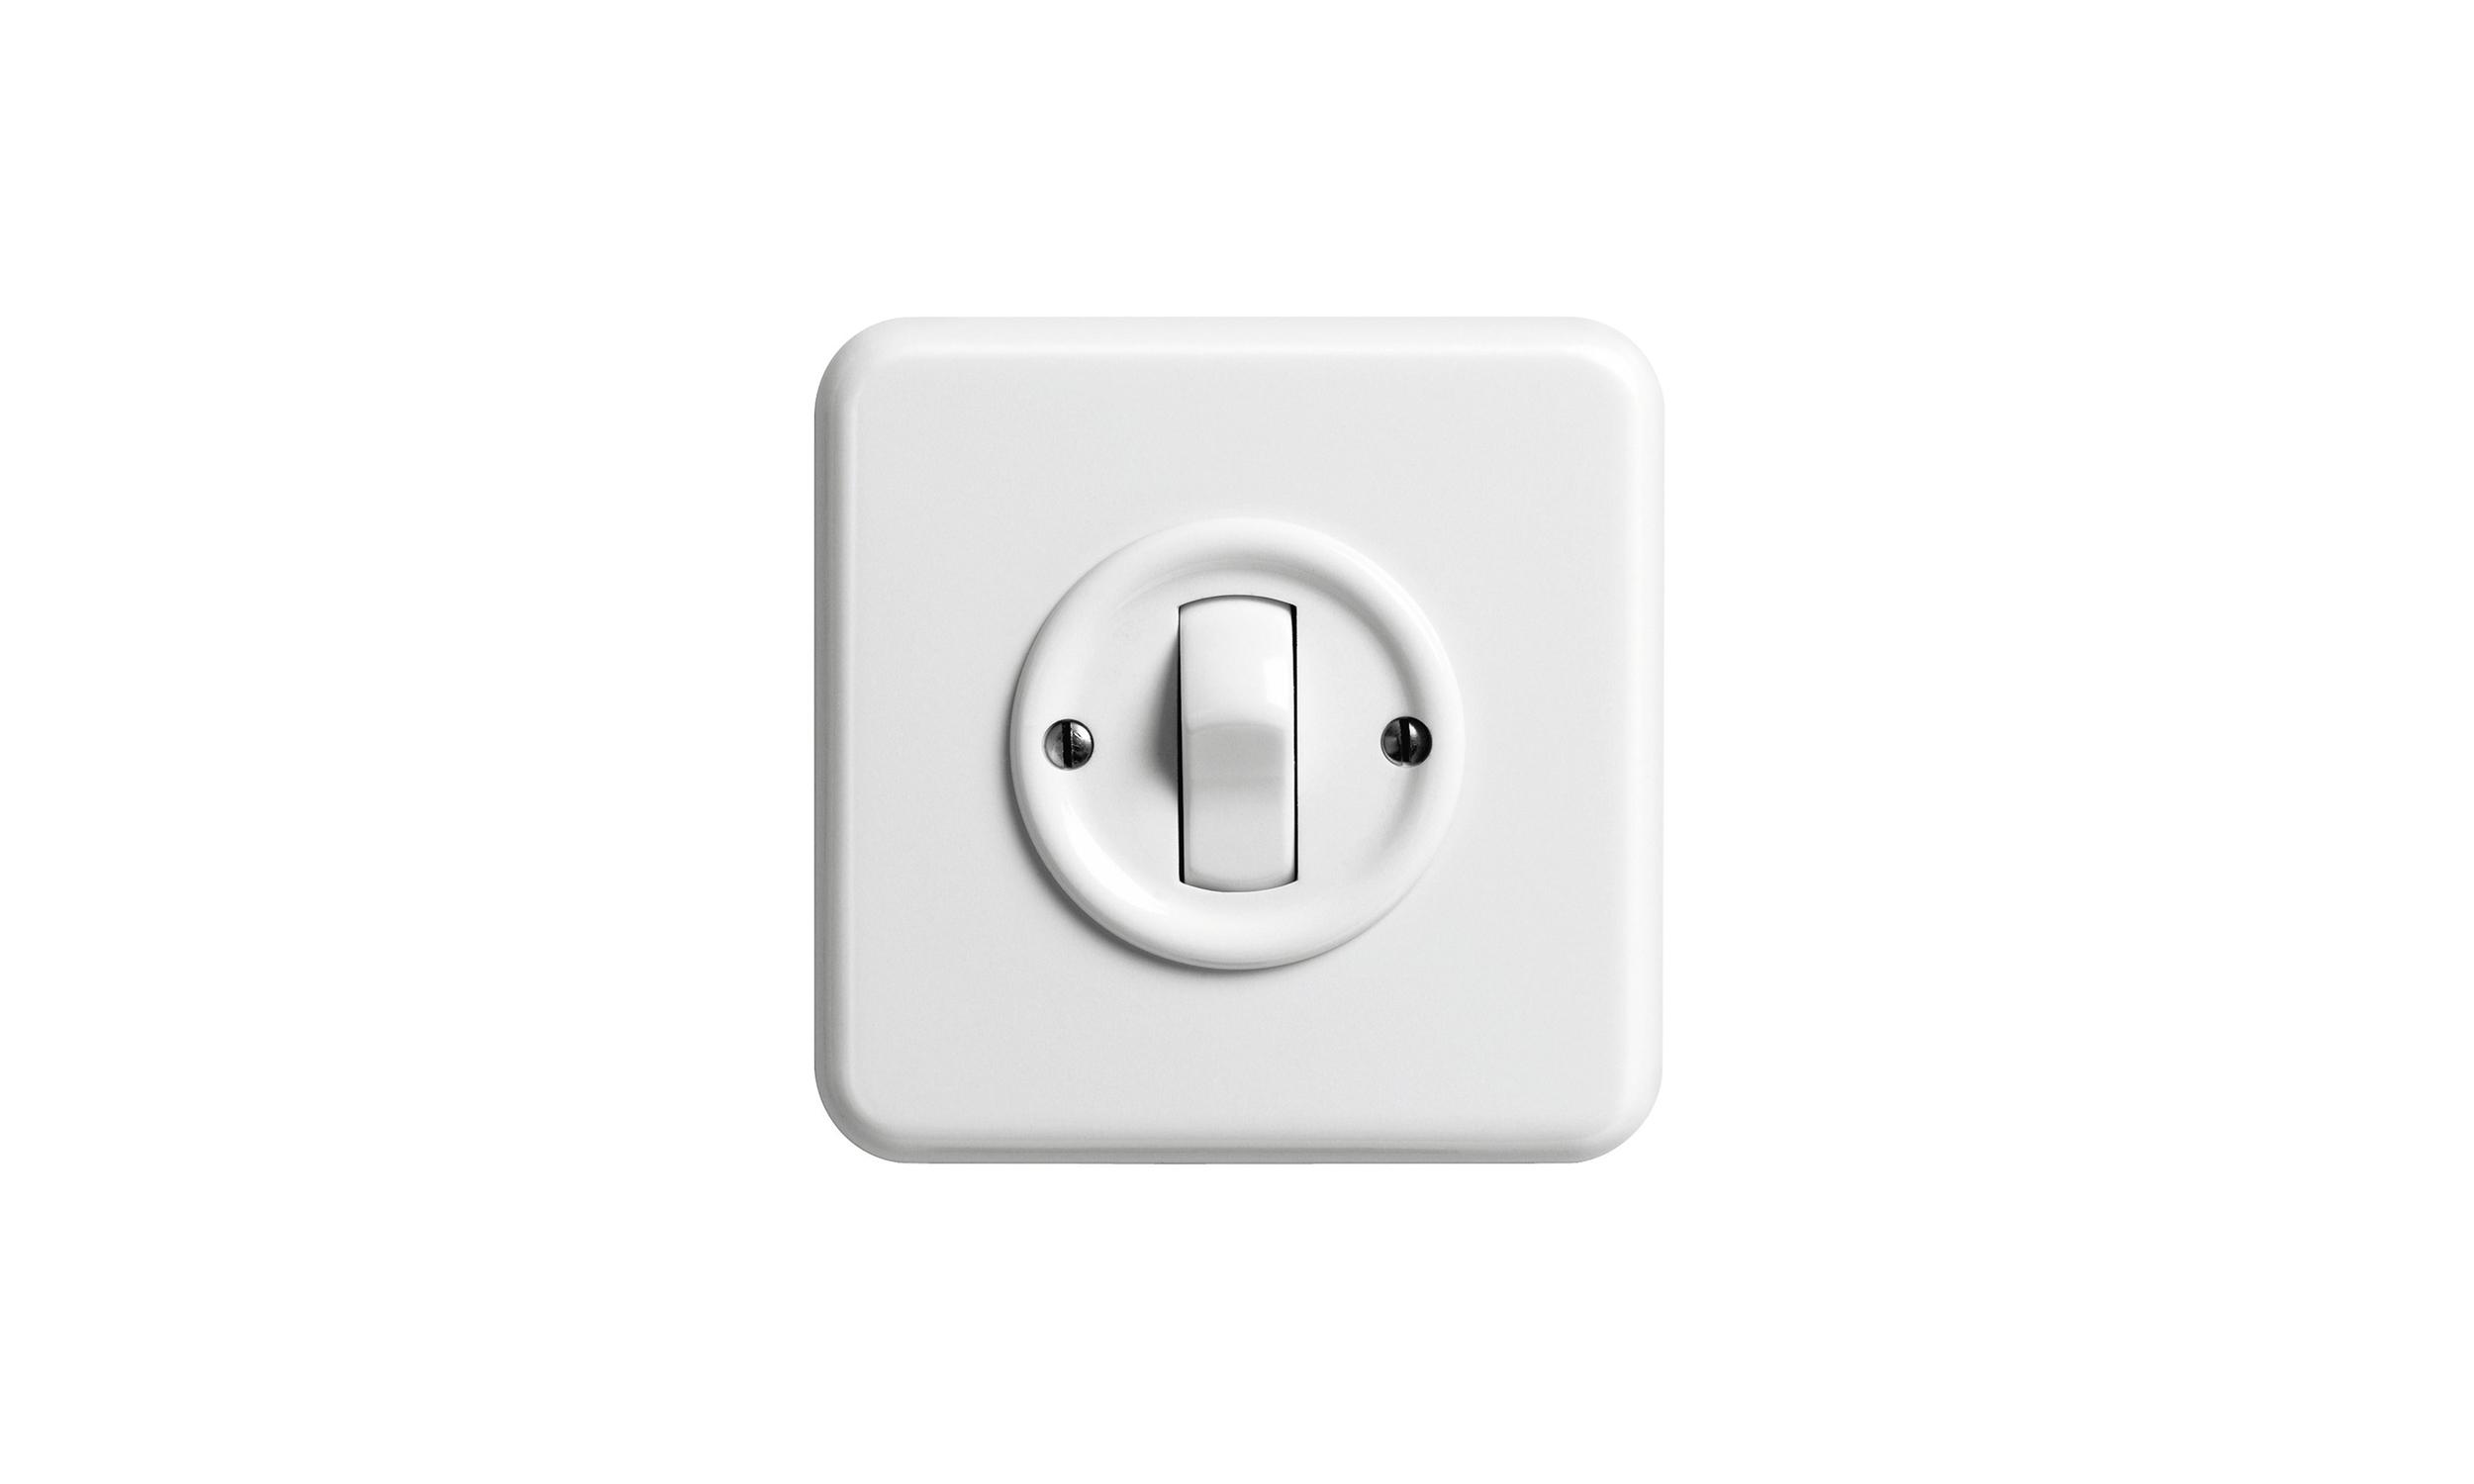 bureau-des-recommandations-light-switch-feller-karl-leuthold.jpg